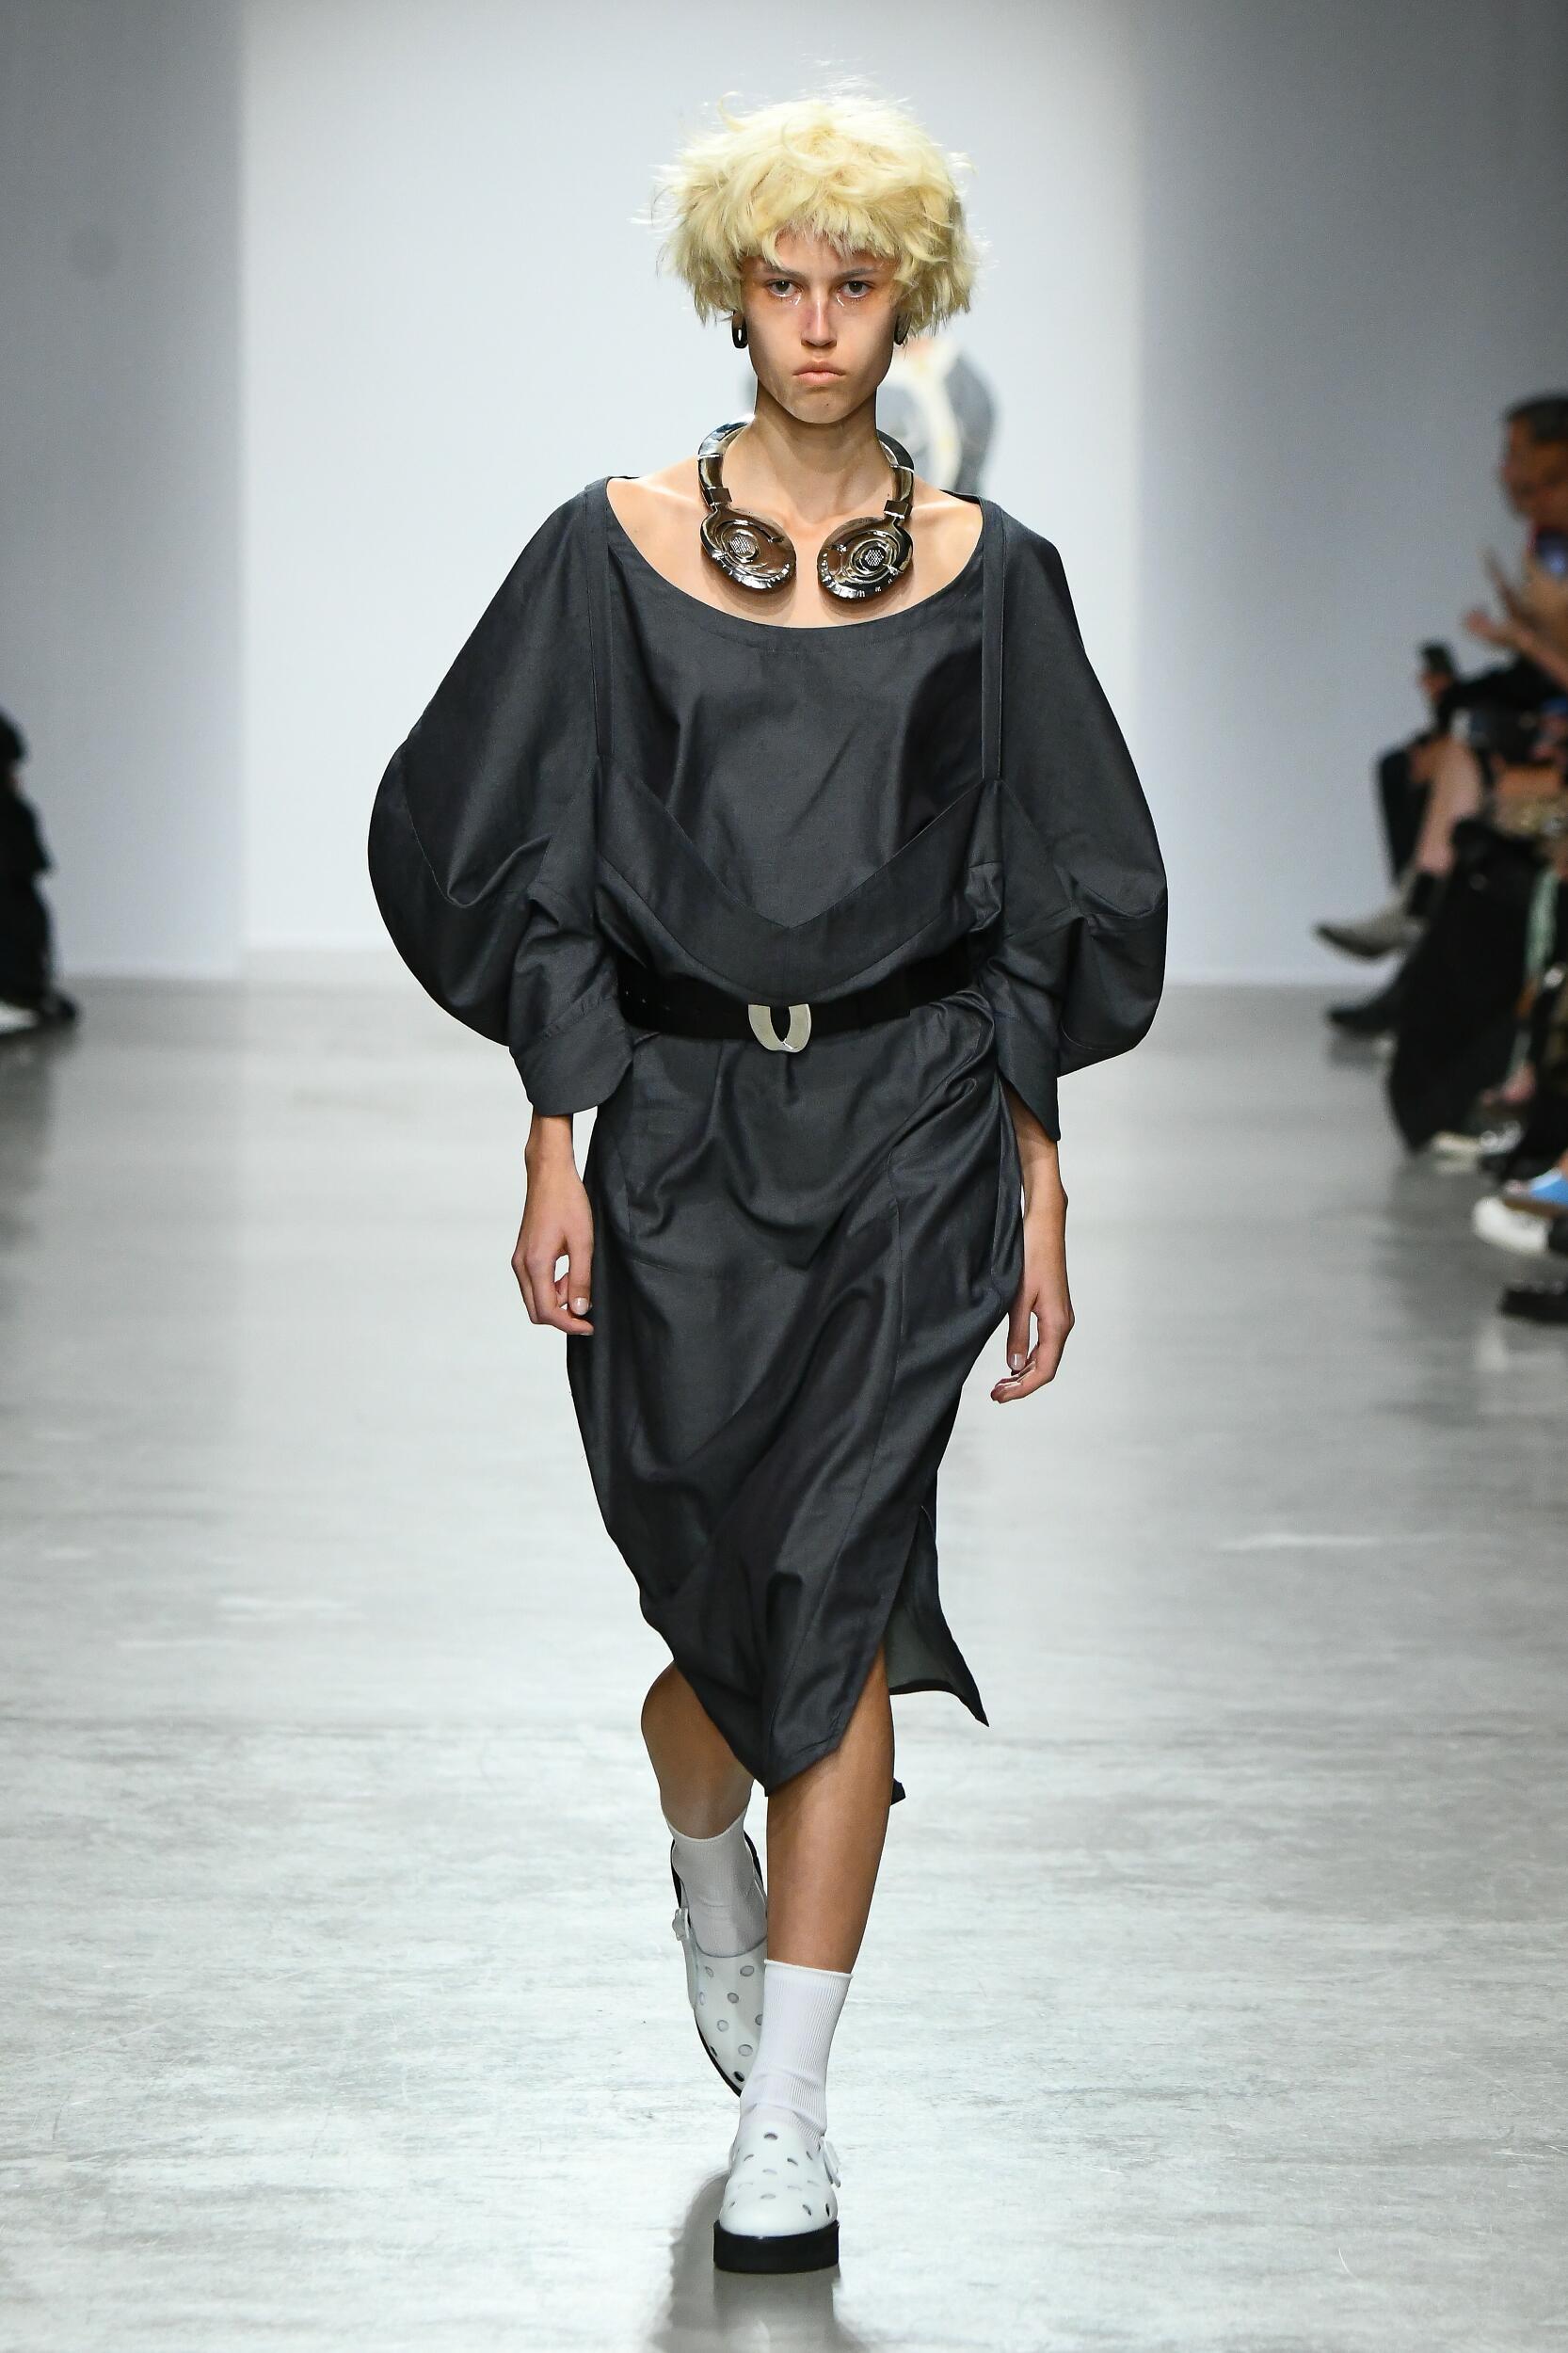 Fashion Model Anrealage Catwalk